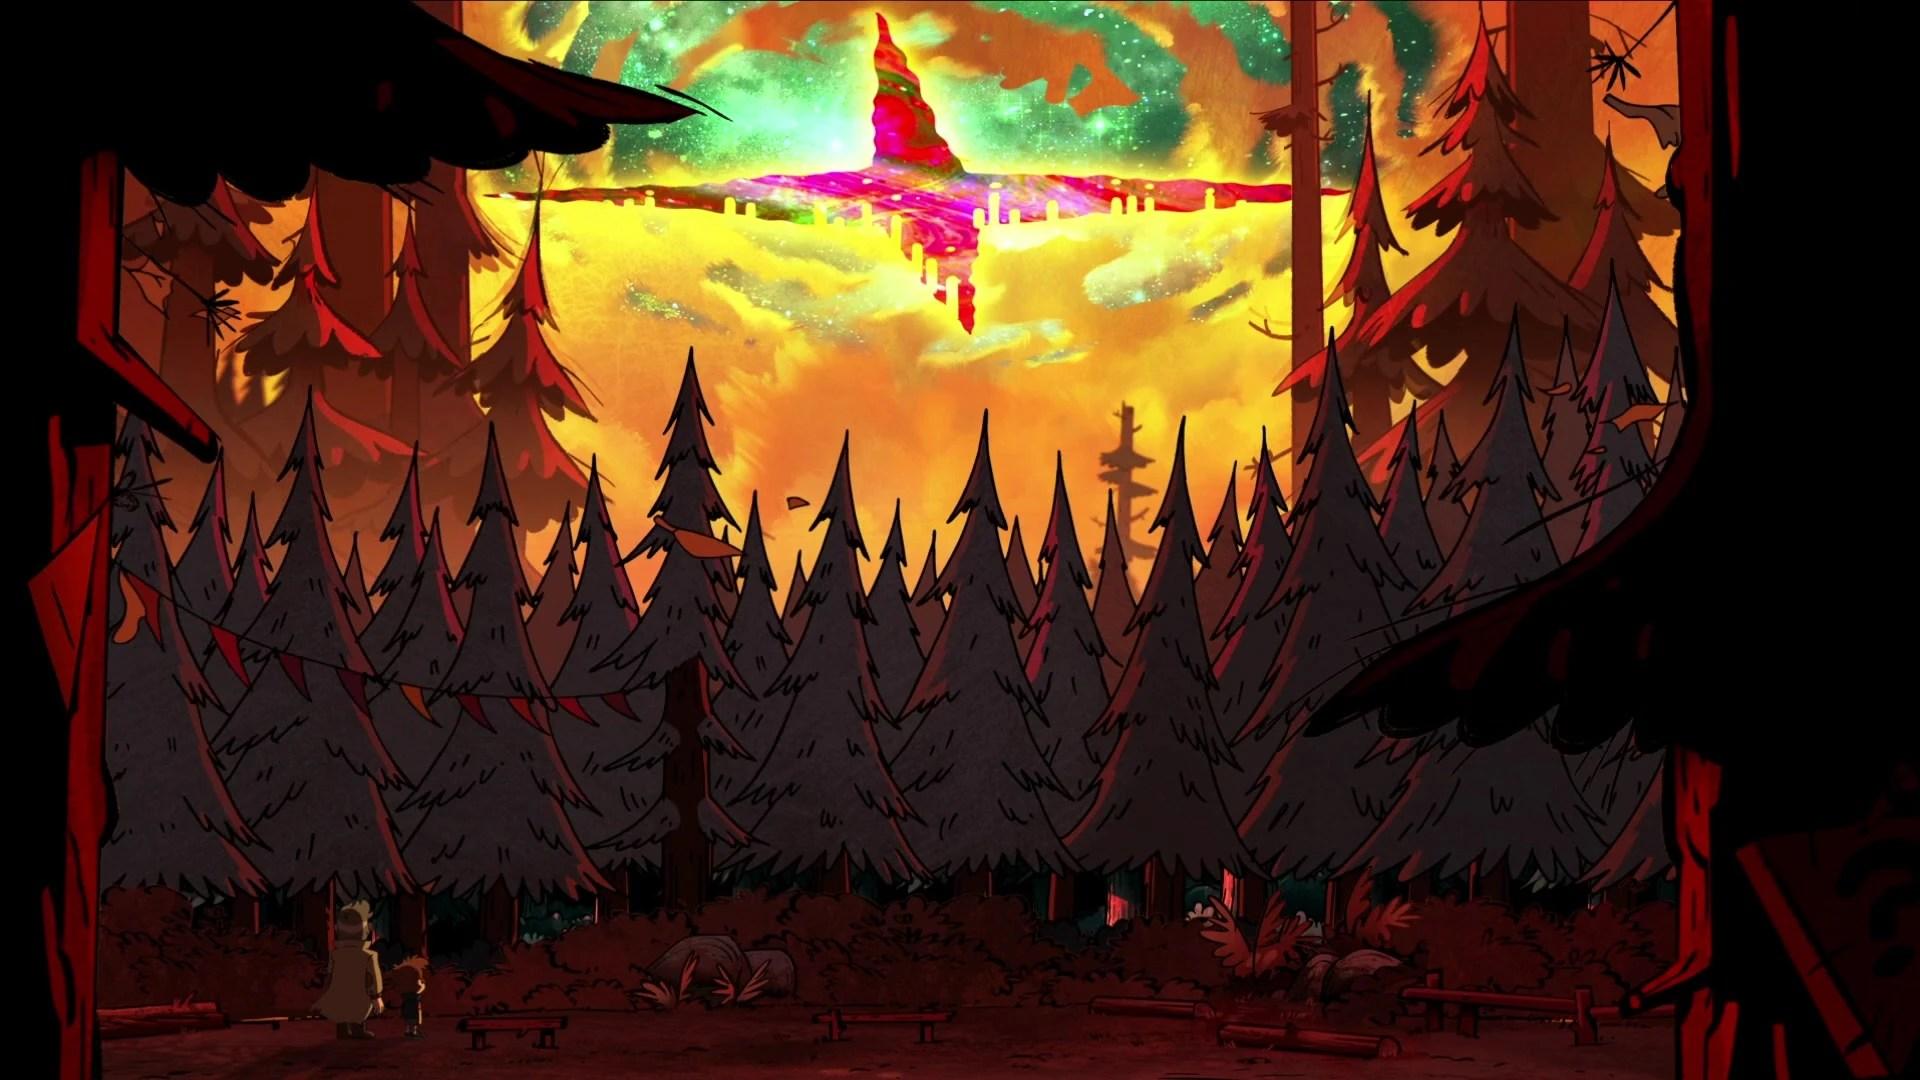 Gravity Falls Wallpaper Forest Странногеддон событие Гравити Фолз Вики Fandom